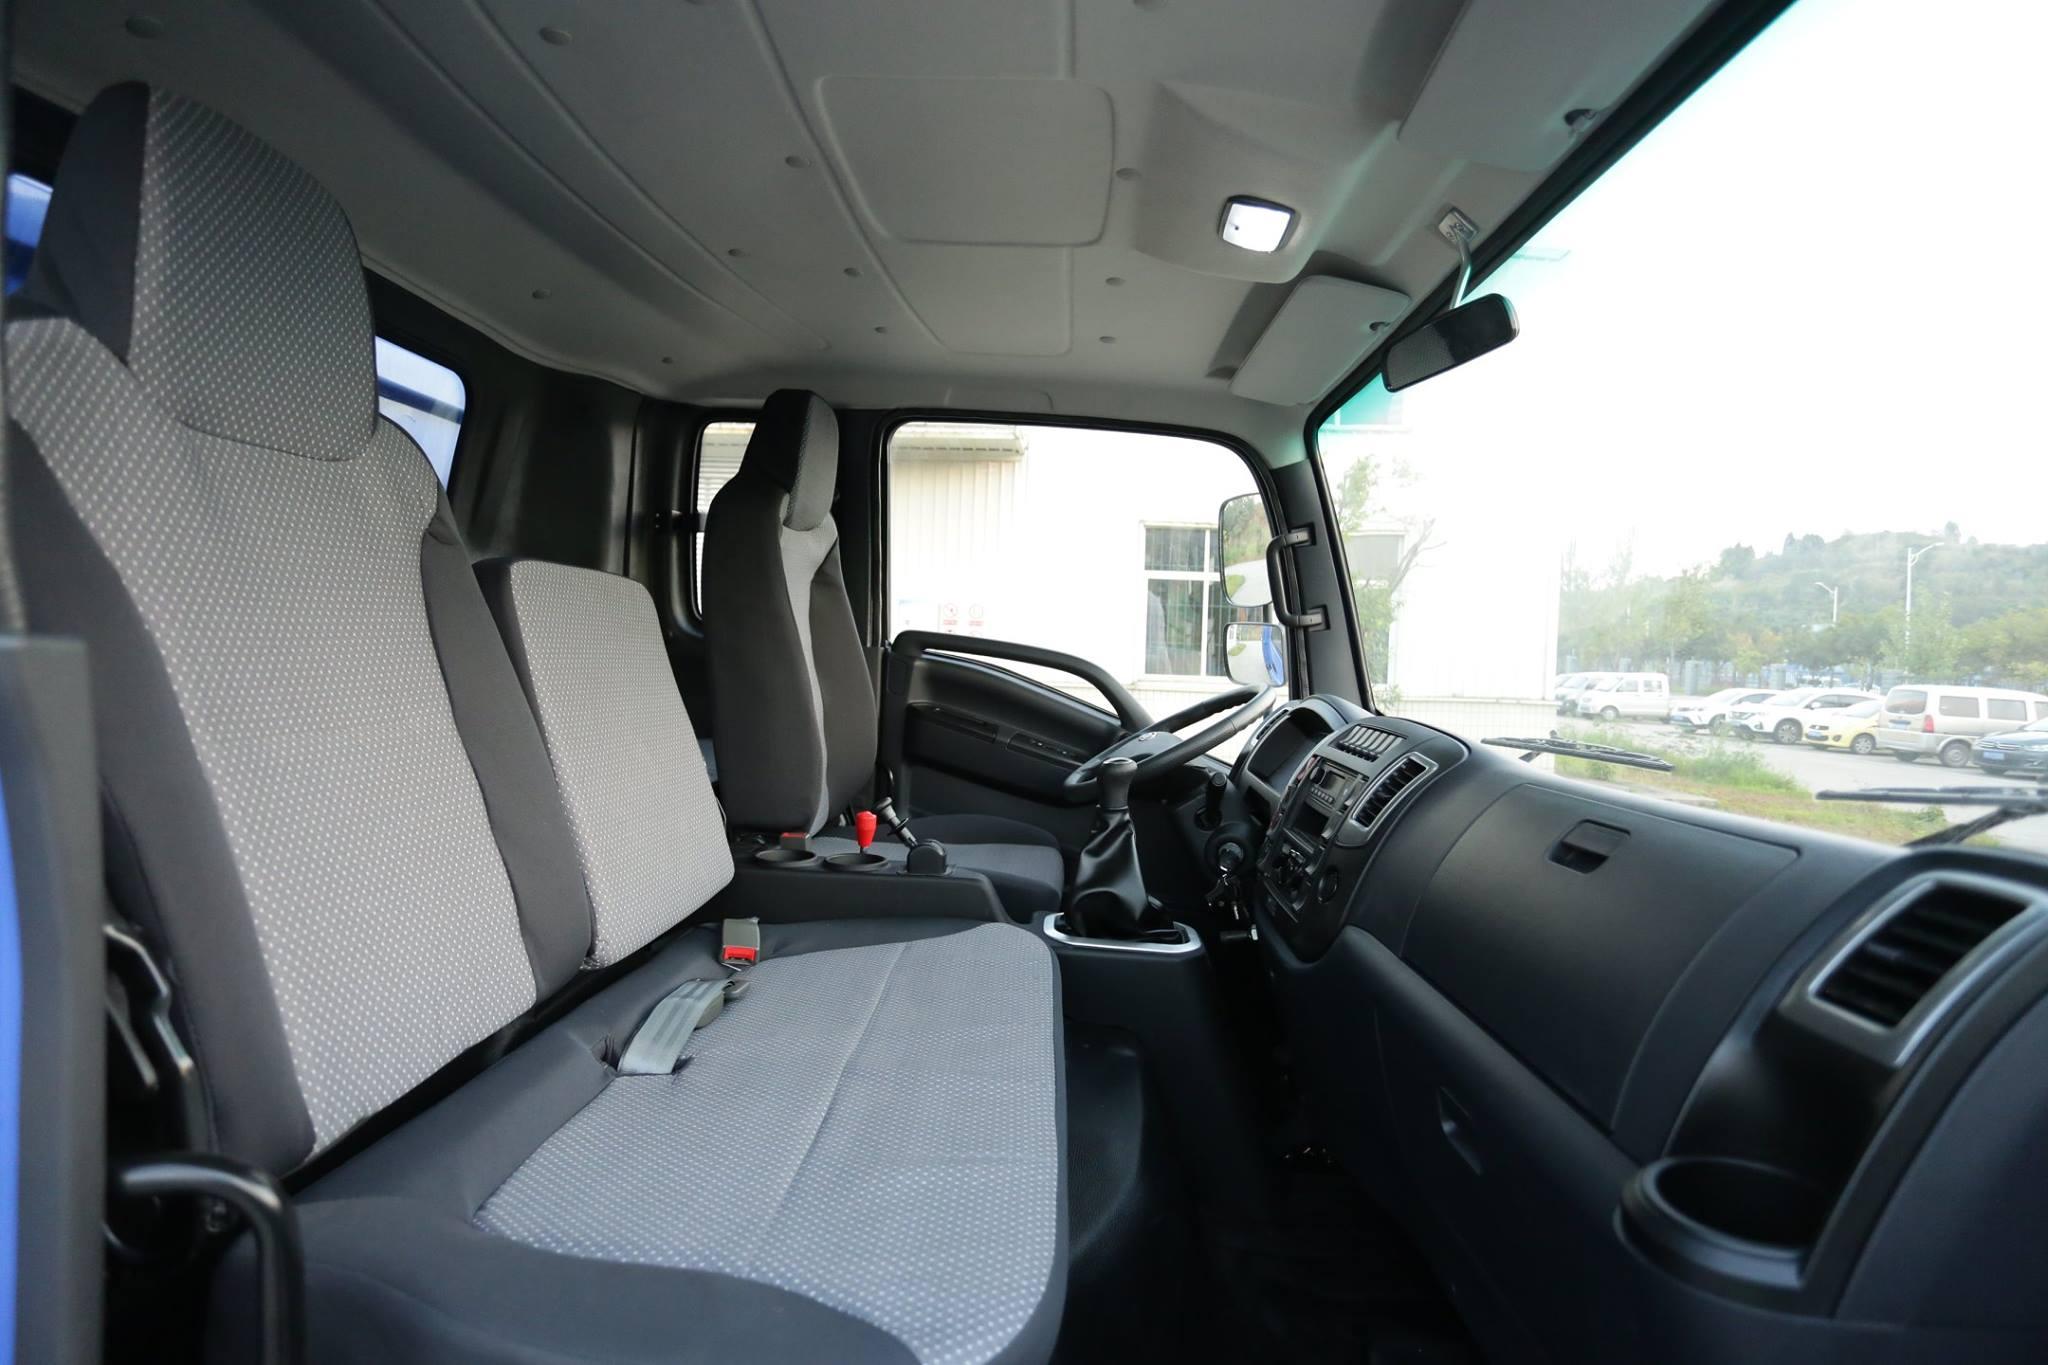 Dumper---diesel-motor-van-80-pk-tot-180-pk---lading-van-4-ton-tot-20-ton12